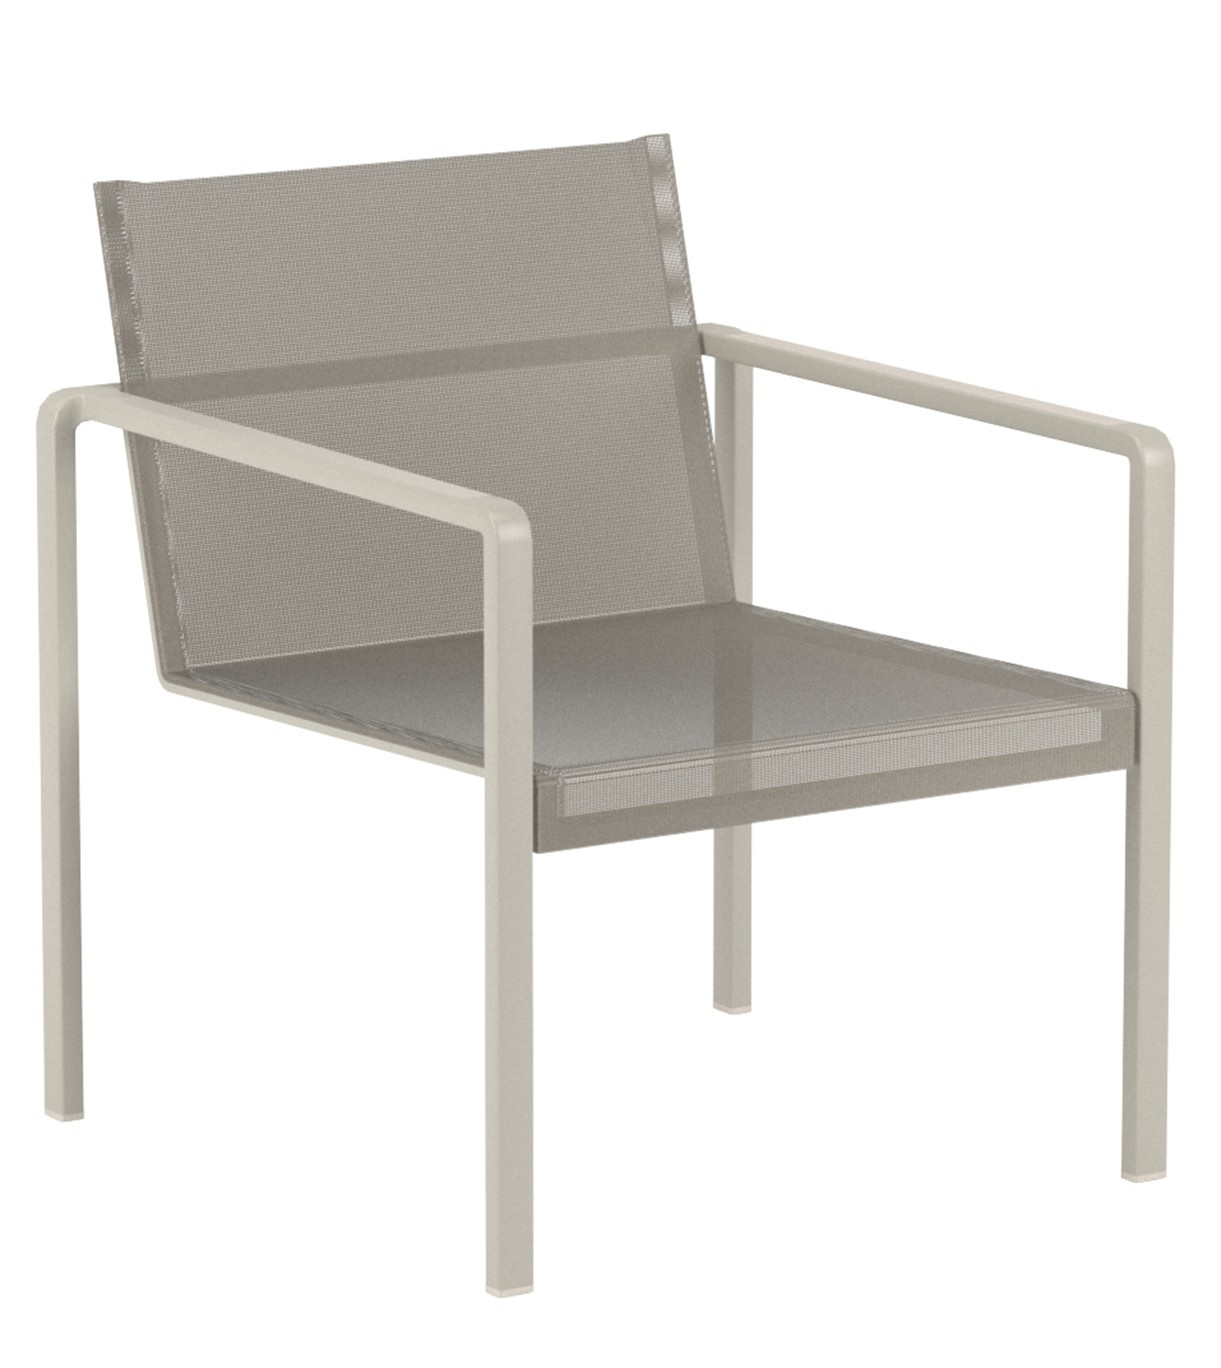 fauteuil bas alura royal botania. Black Bedroom Furniture Sets. Home Design Ideas